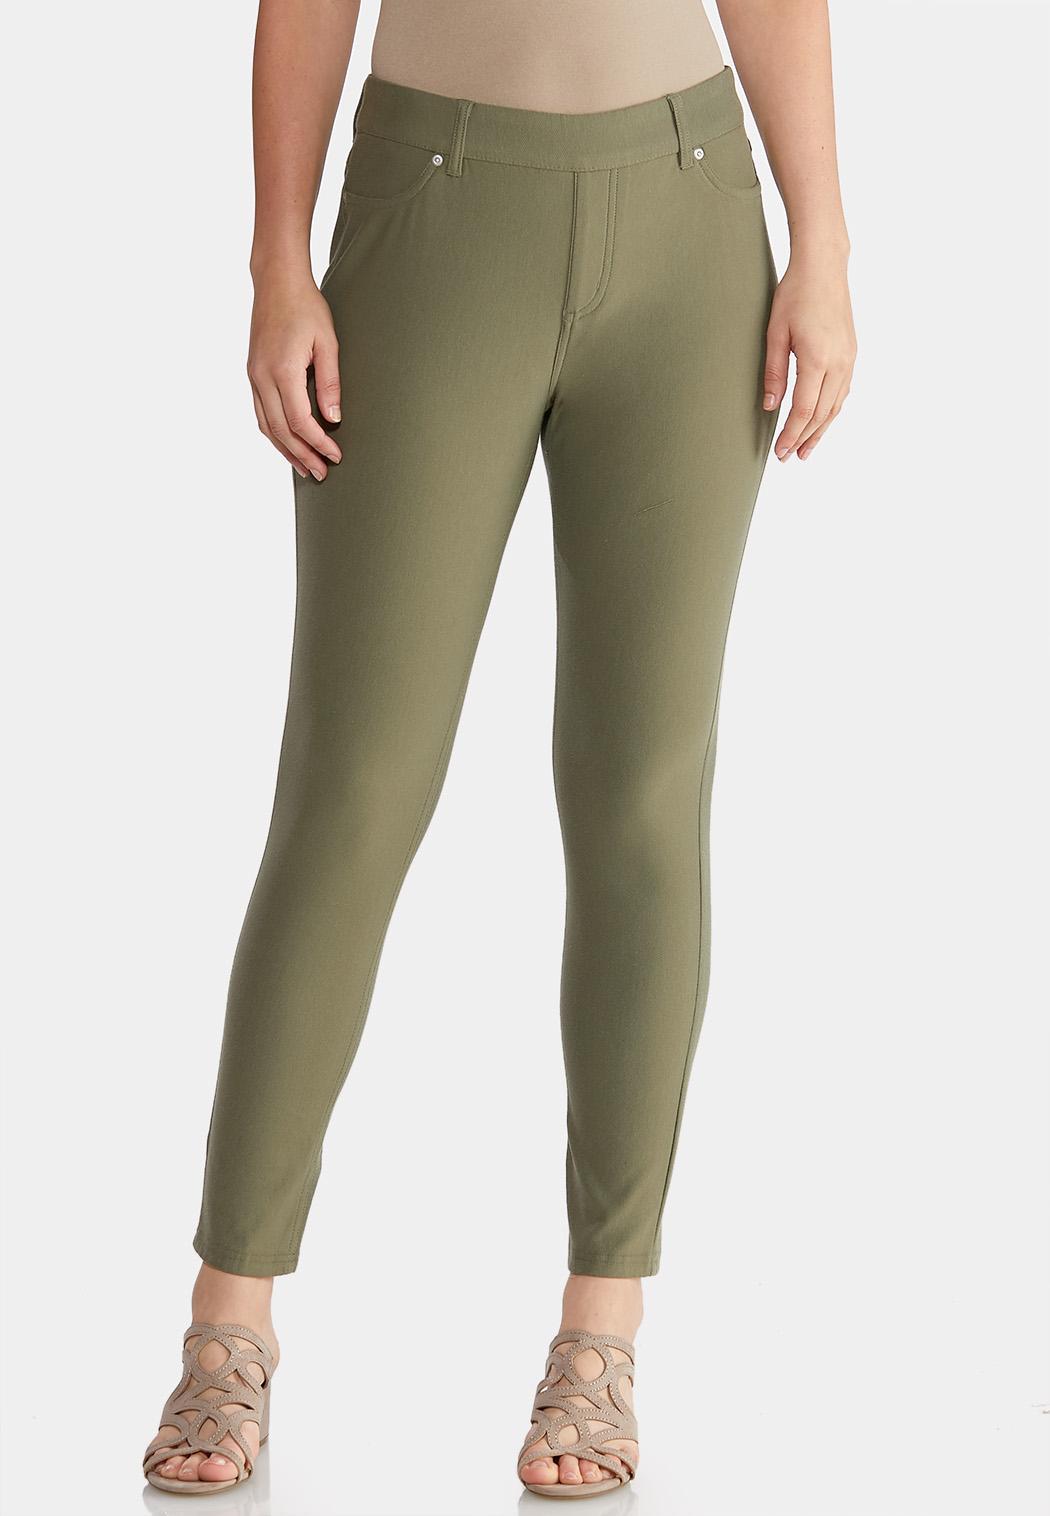 Skinny Knit Pants